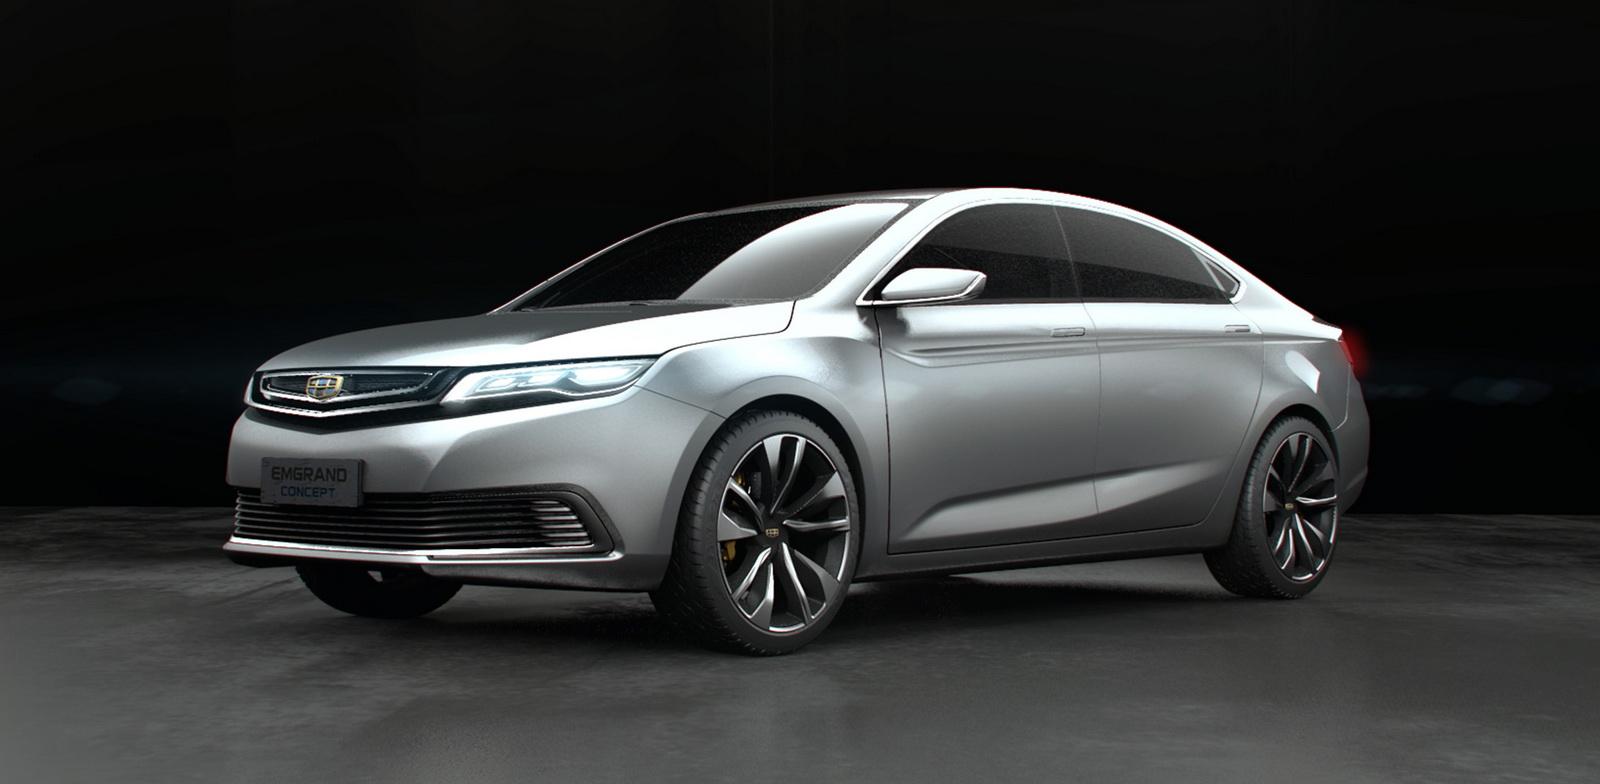 2015 - [Chine] Salon Auto de Shanghai - Page 2 2015-Geely-Emgrand-Concept-01